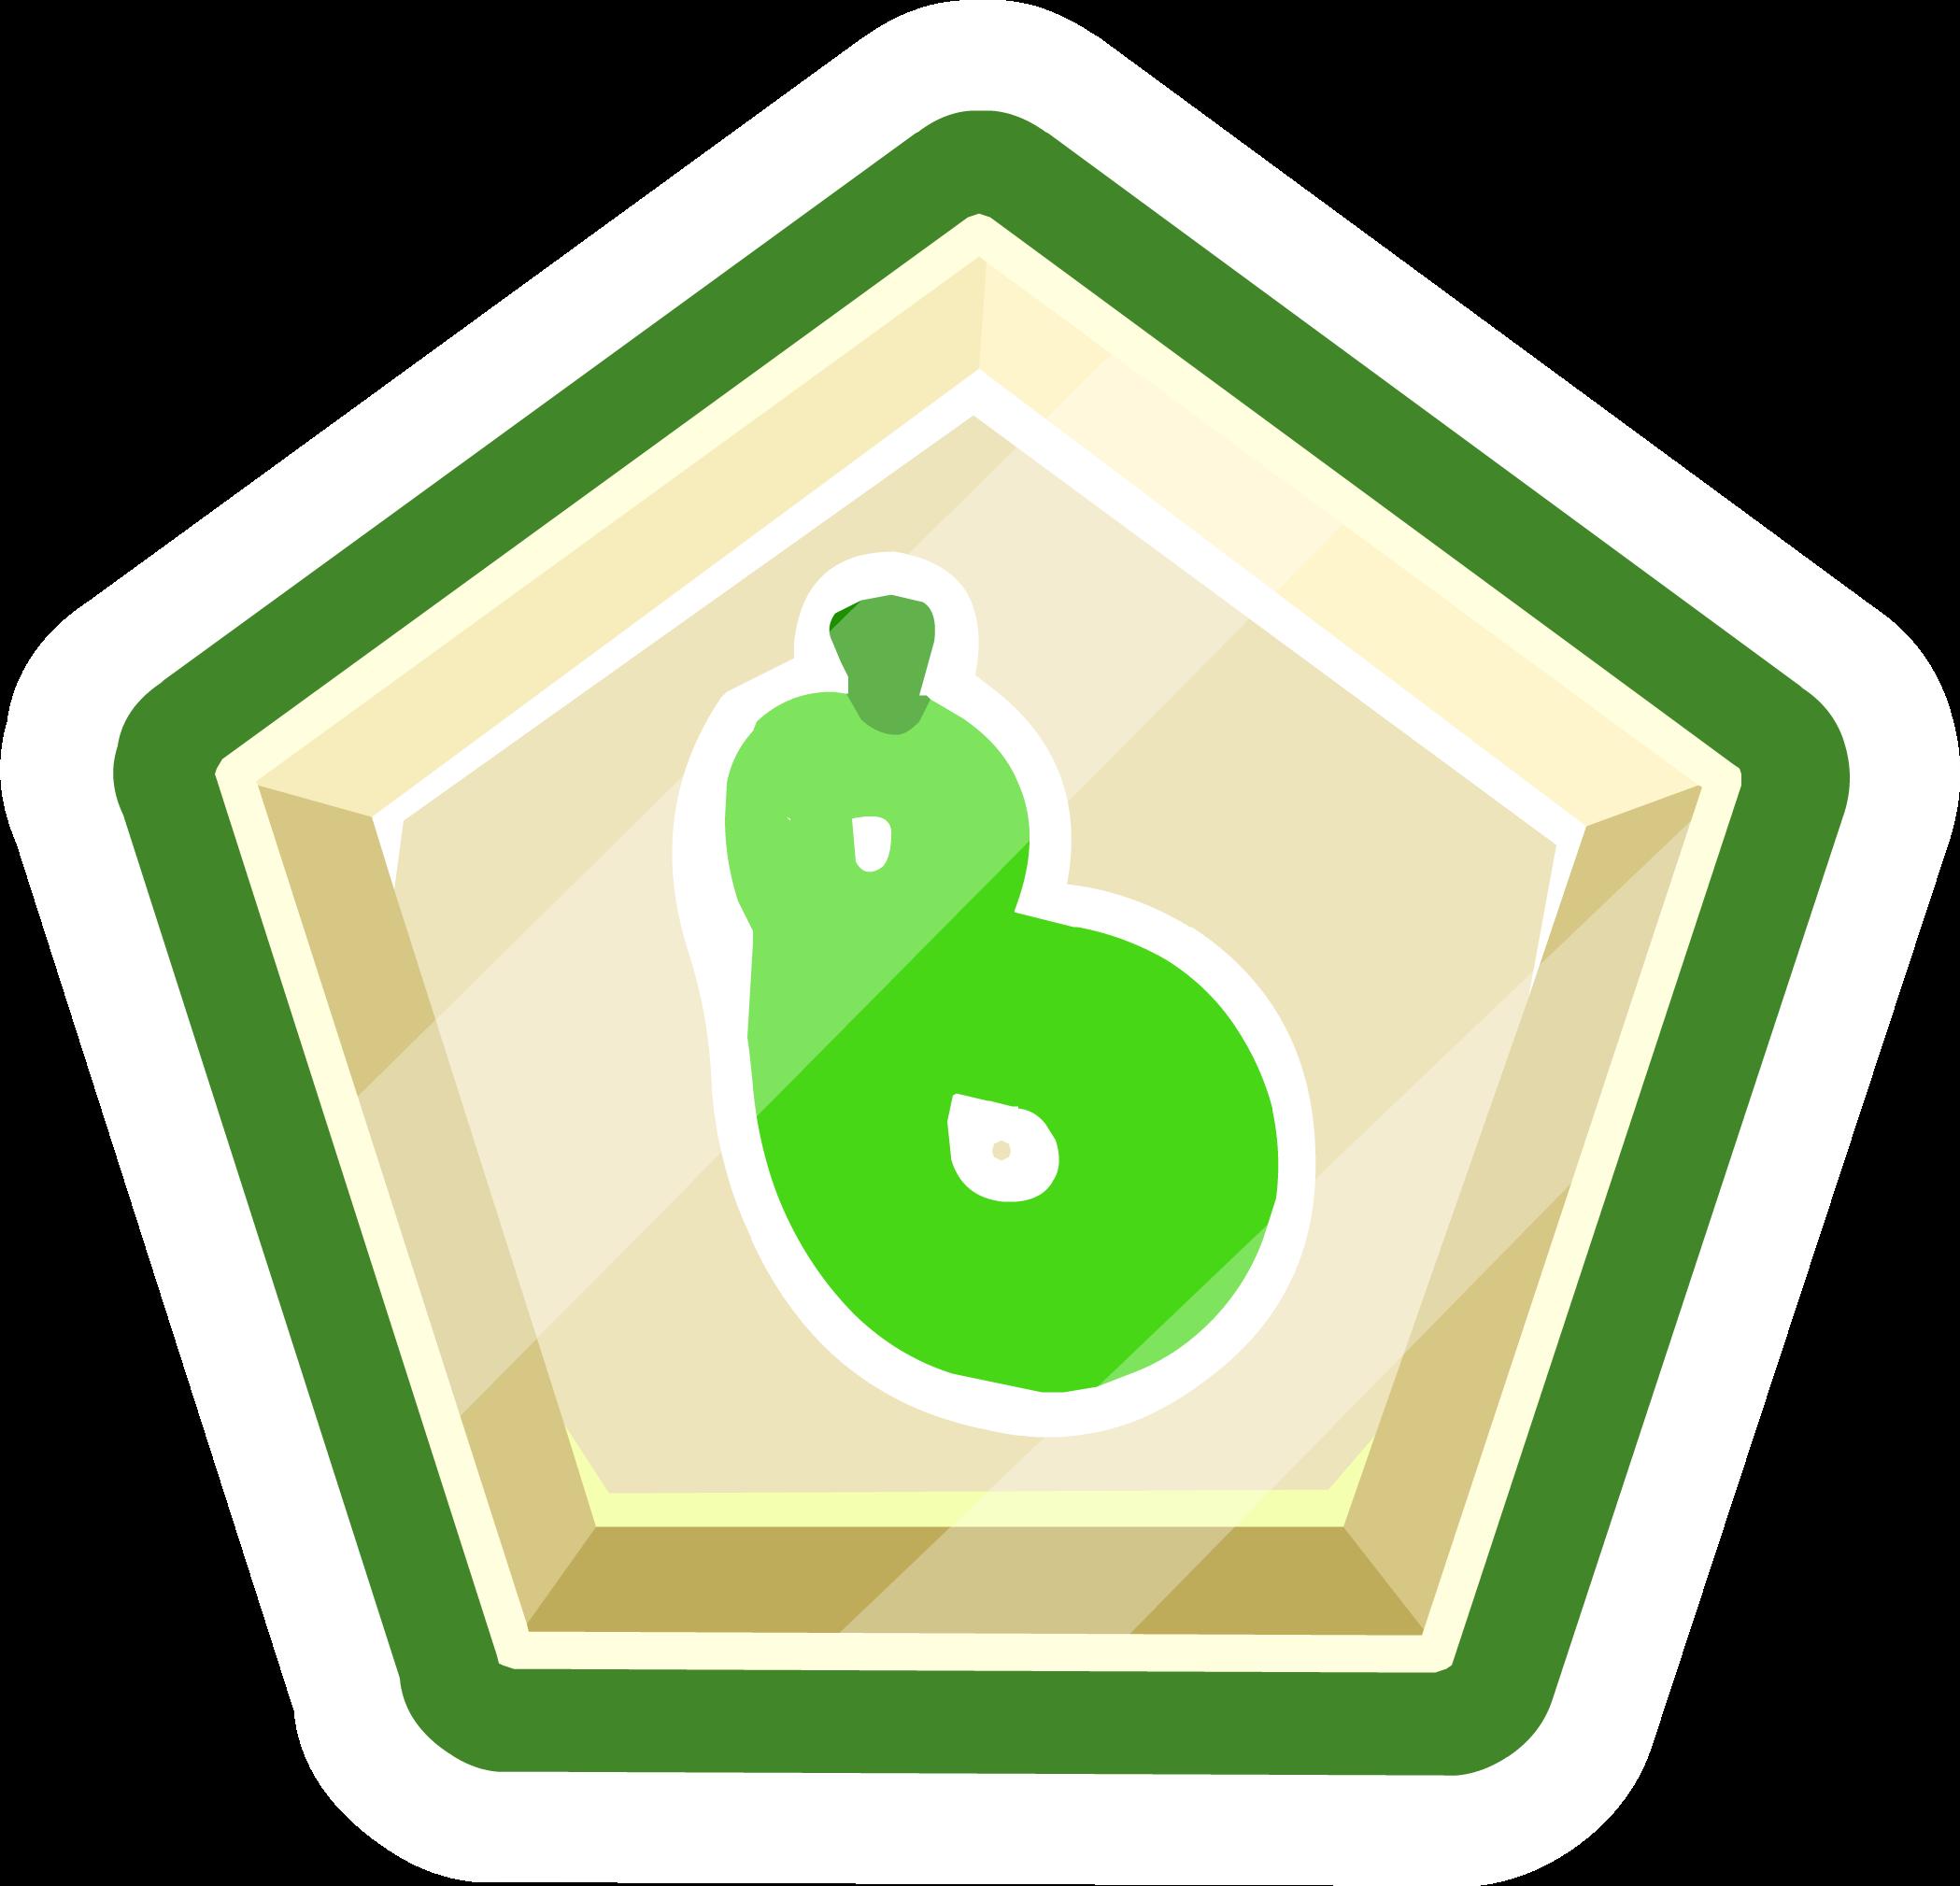 Green O'berry Pin